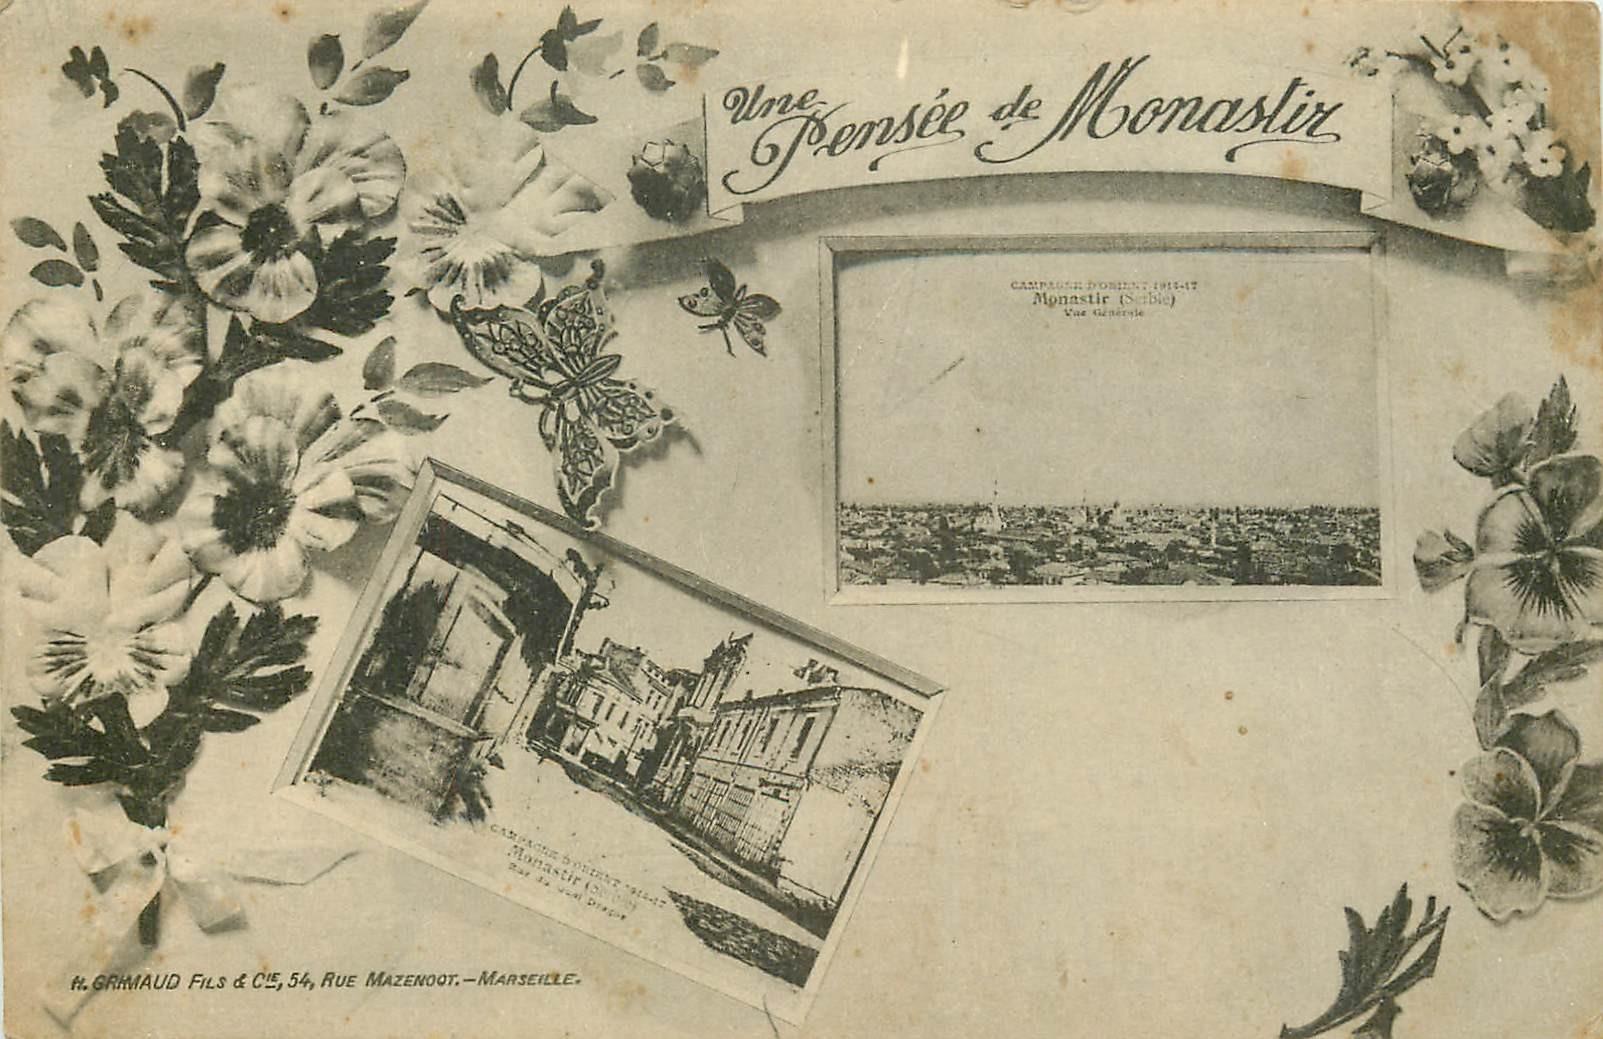 GRECE TURQUIE. Campagne d'Orient à Monastir Serbie 1918